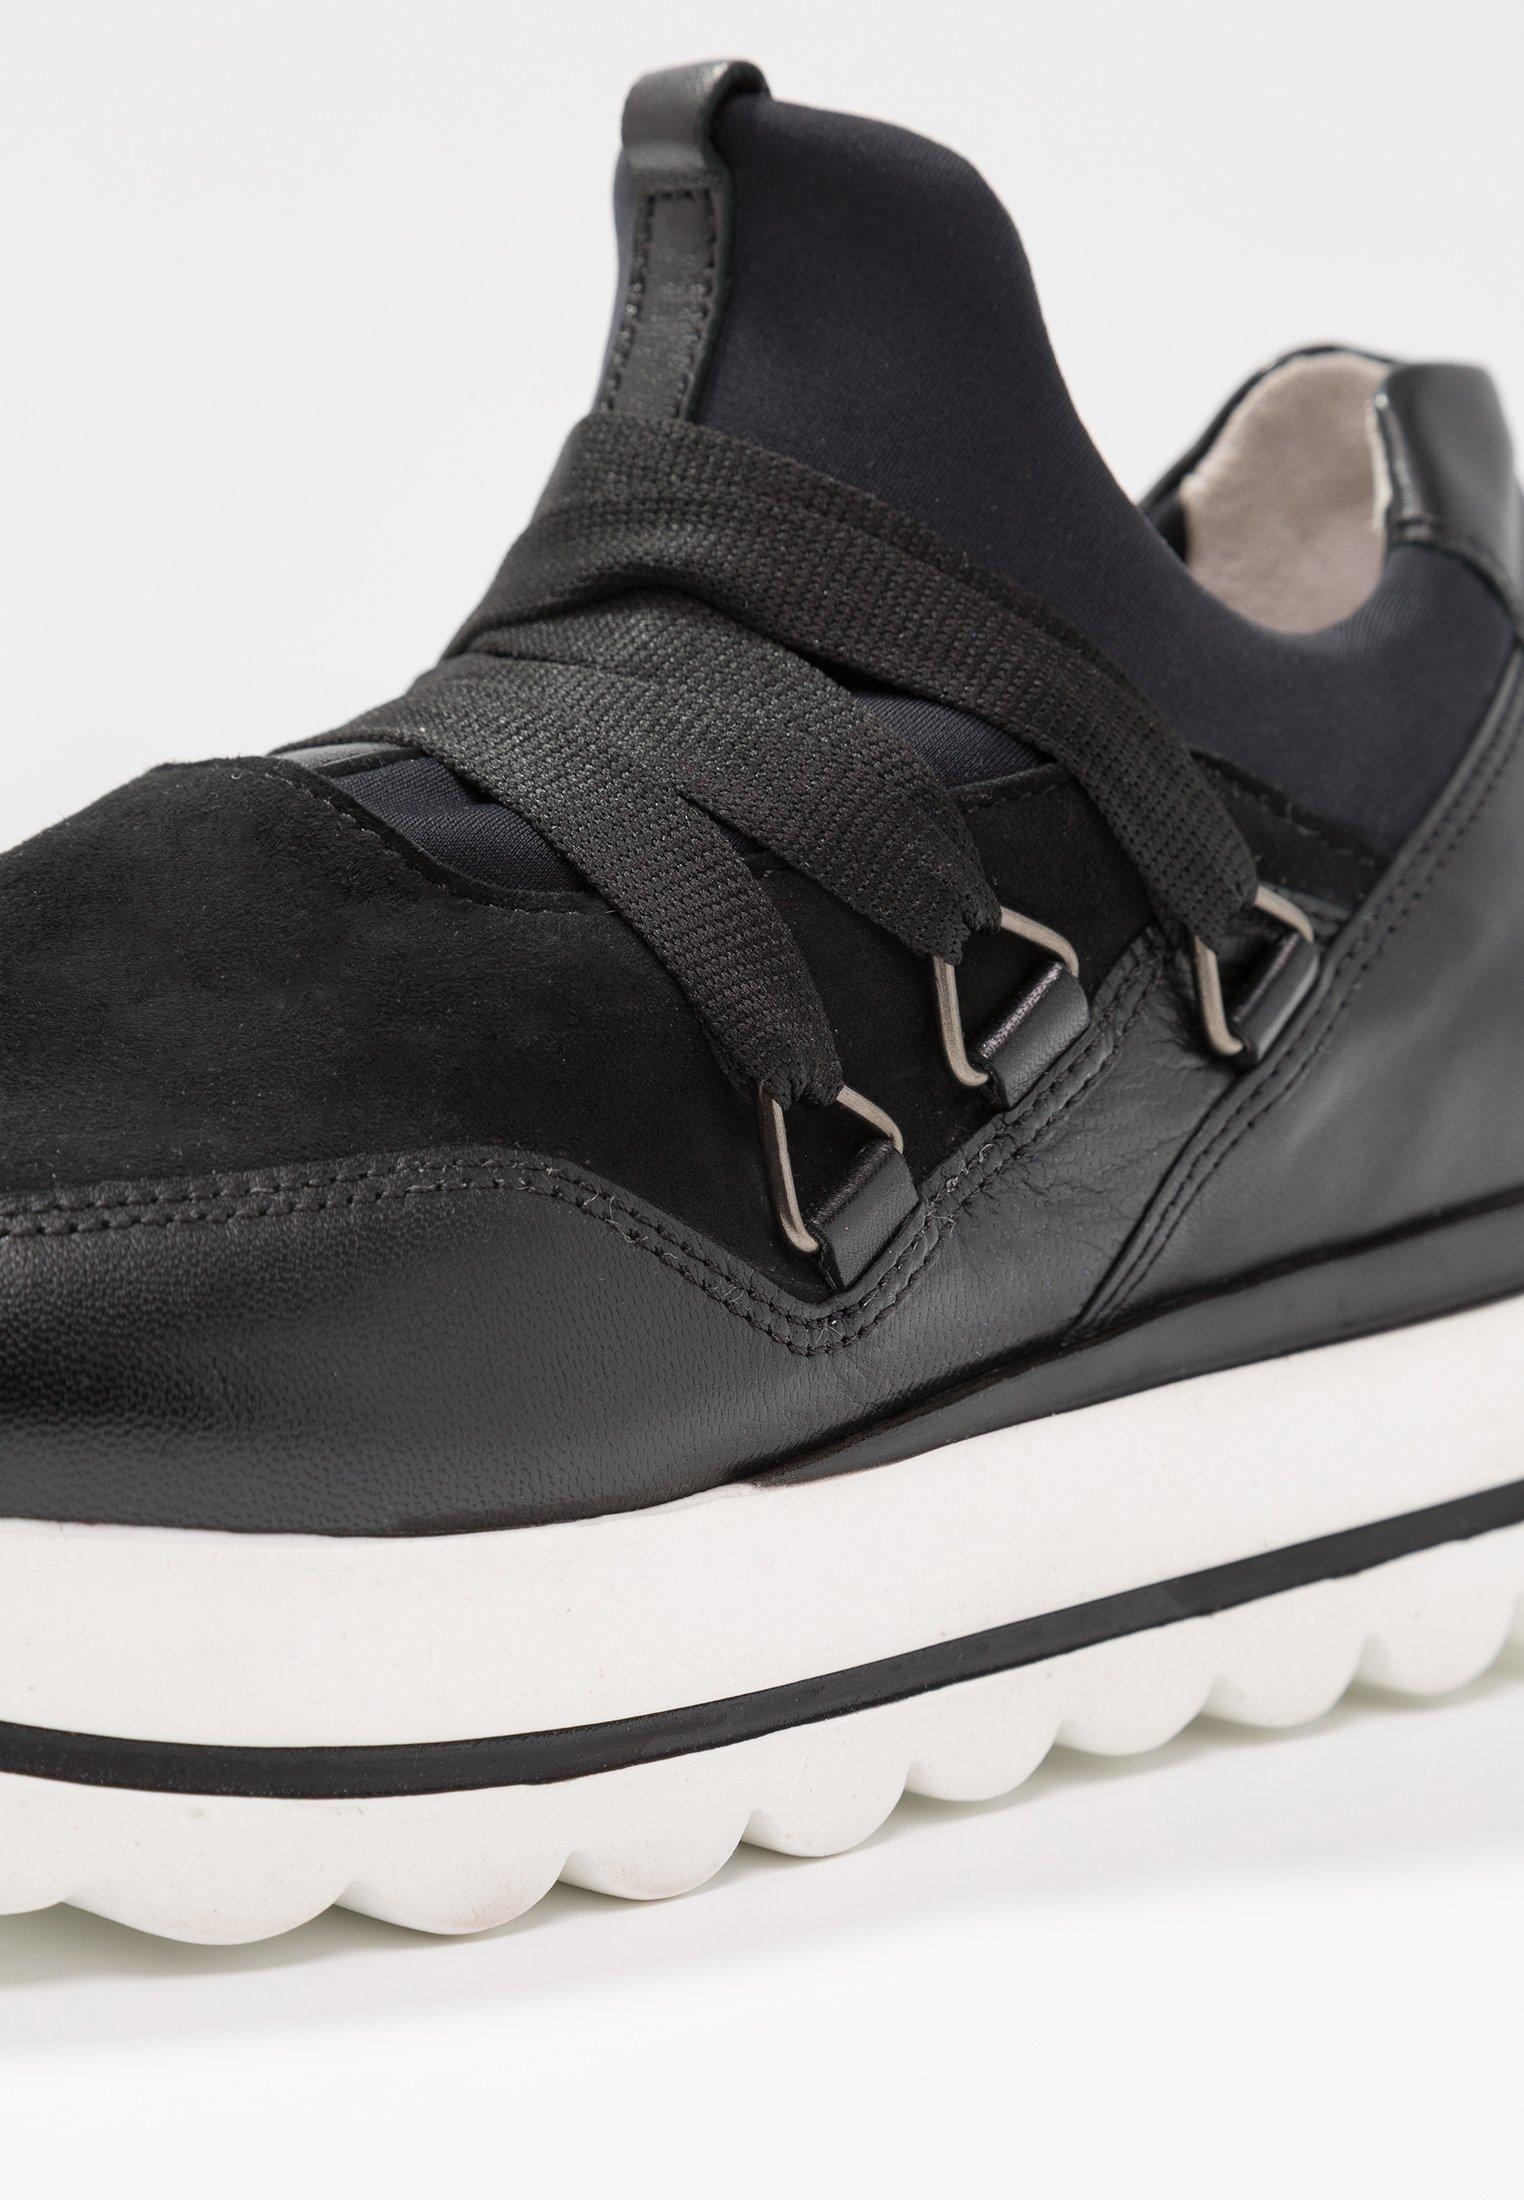 Gabor Gabor Schwarz Sneakers Basse Sneakers Basse Sneakers Gabor Schwarz Pk0XwOn8